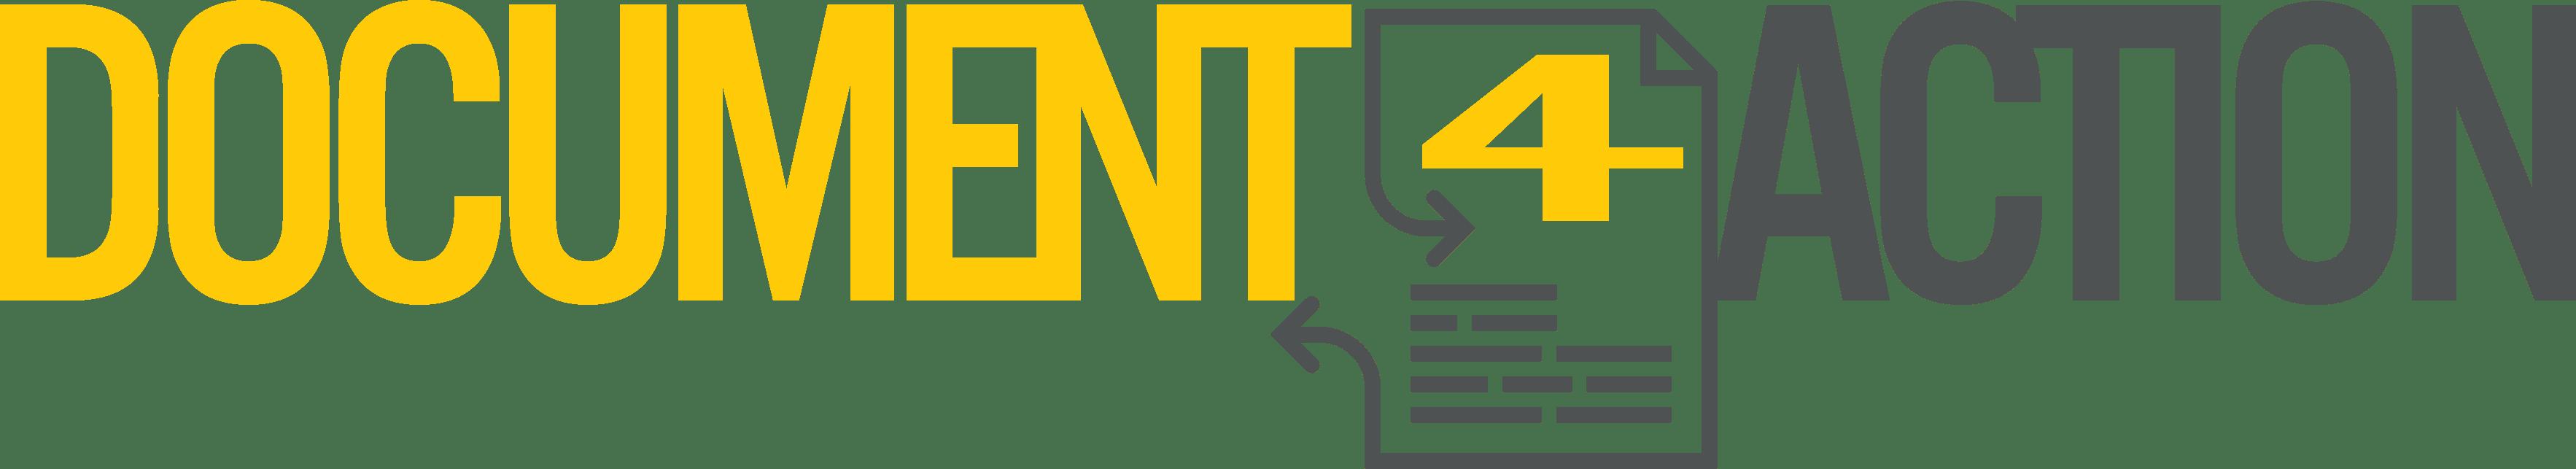 Logo horizontal de Document4Action